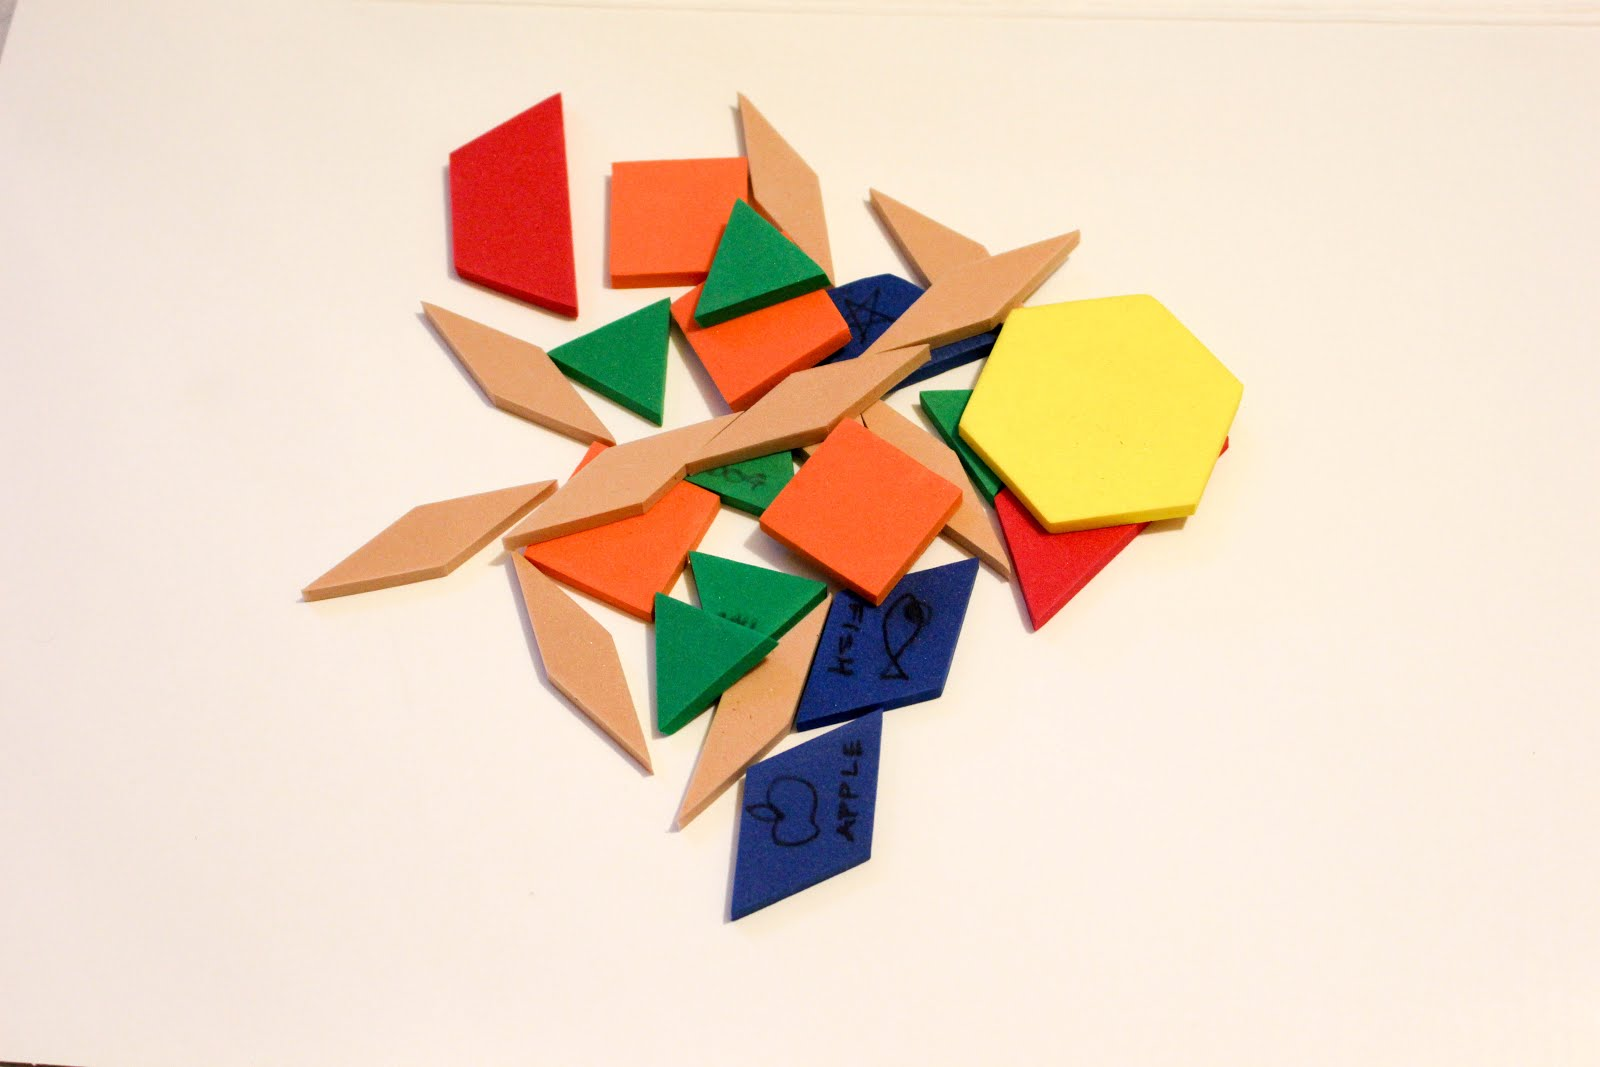 Figure 04. Prototype - Version 1c